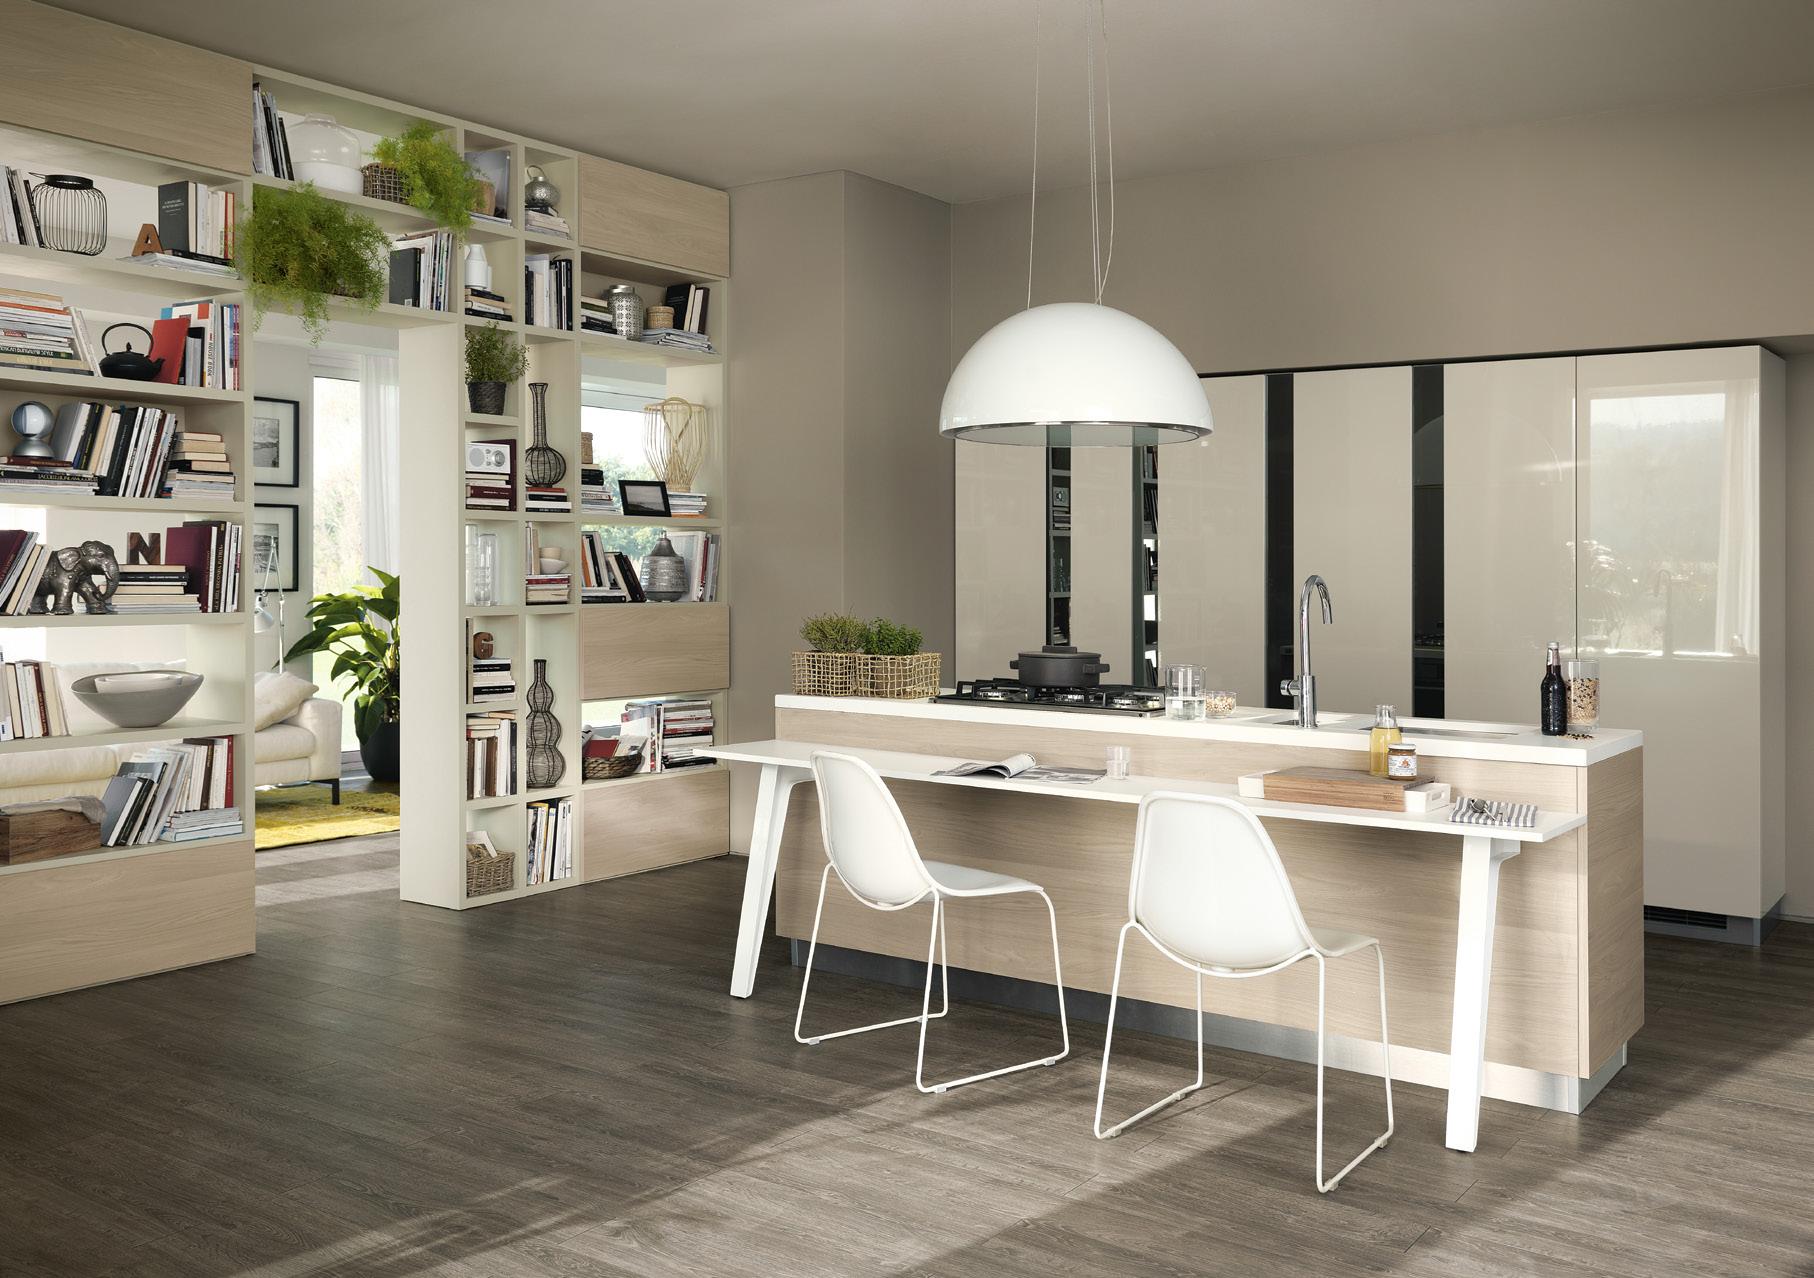 Cucina motus scavolini centro mobili - Mobili living scavolini ...